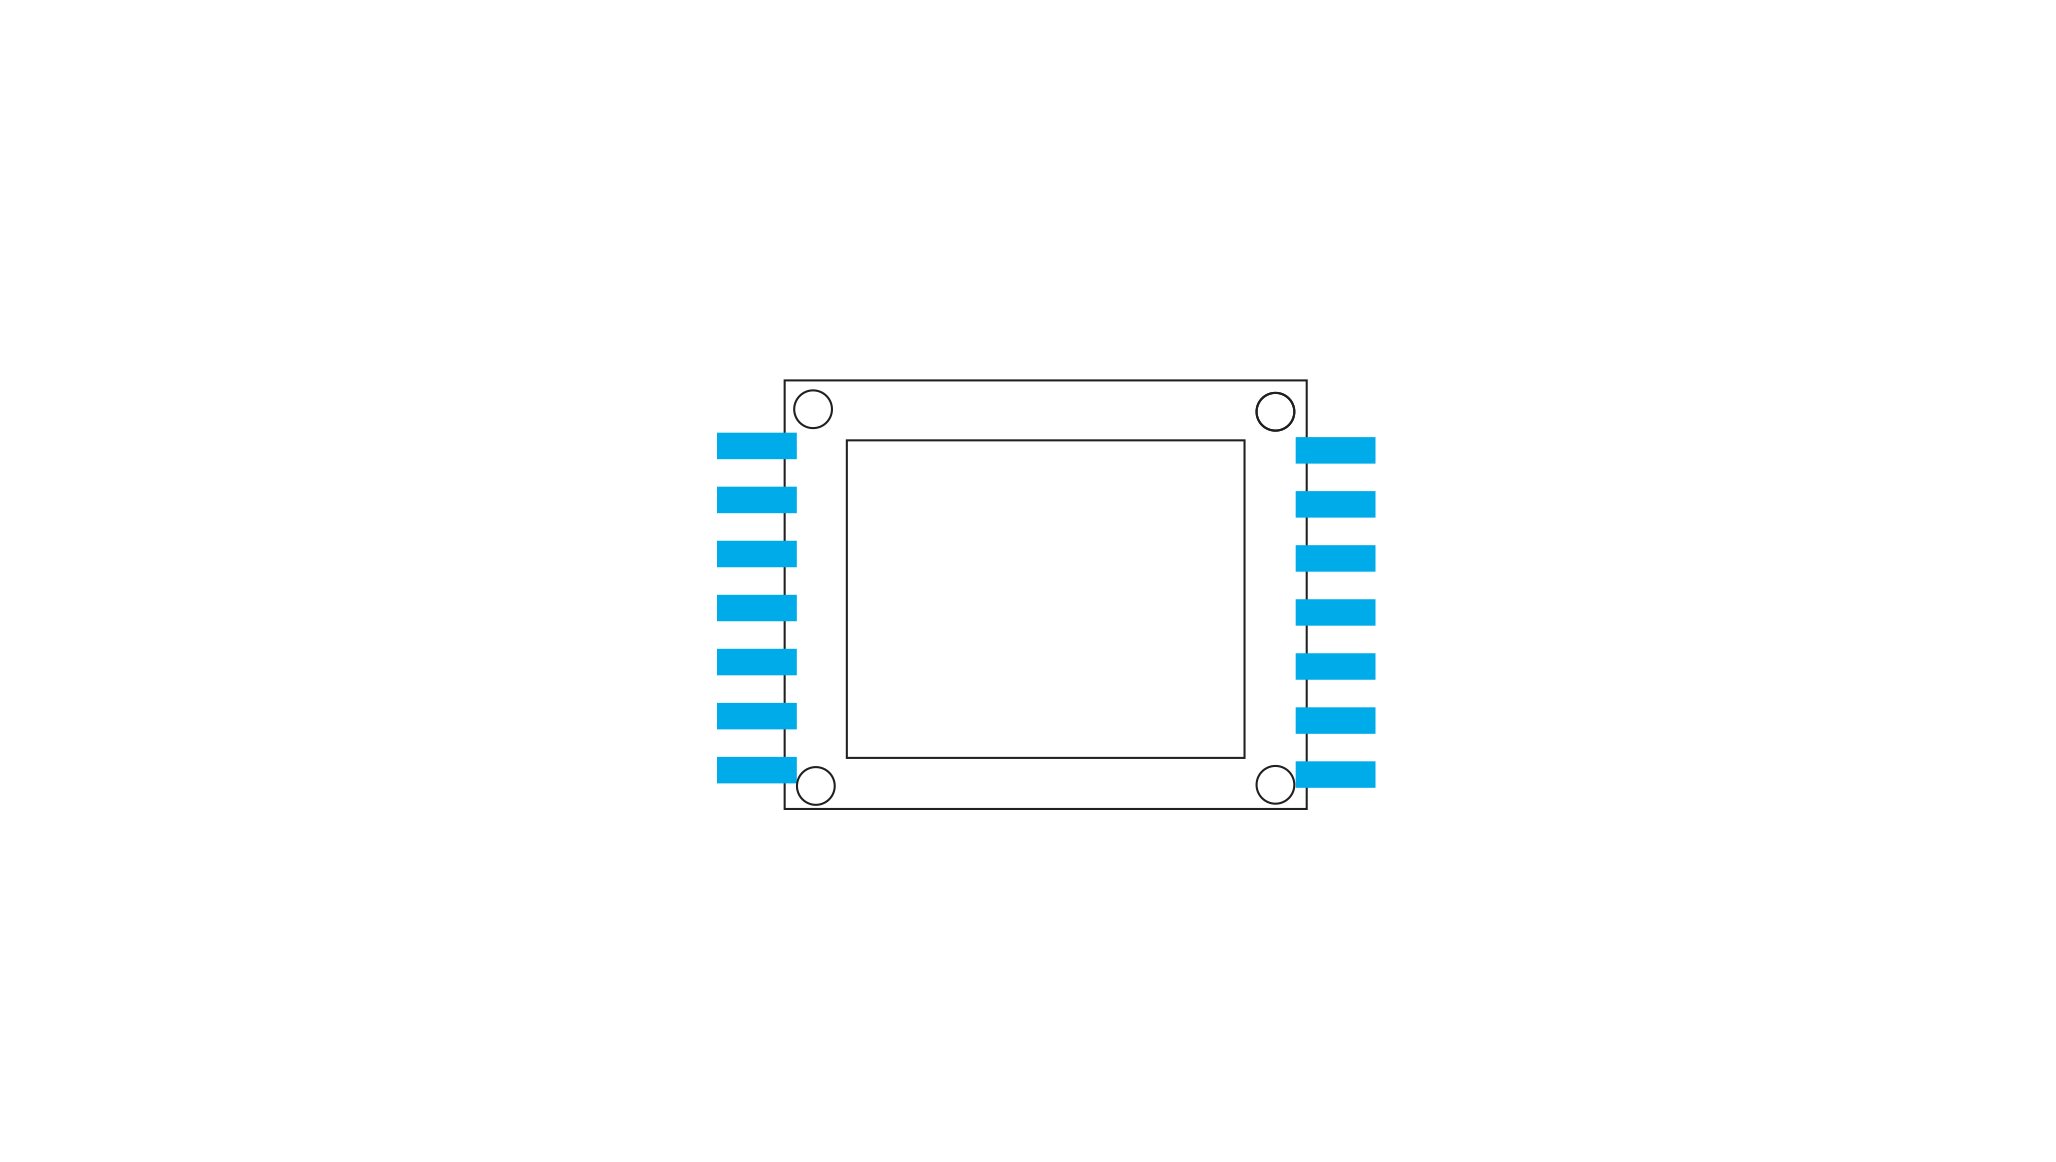 PAS-880-Oblique-System-sensor-icon-1